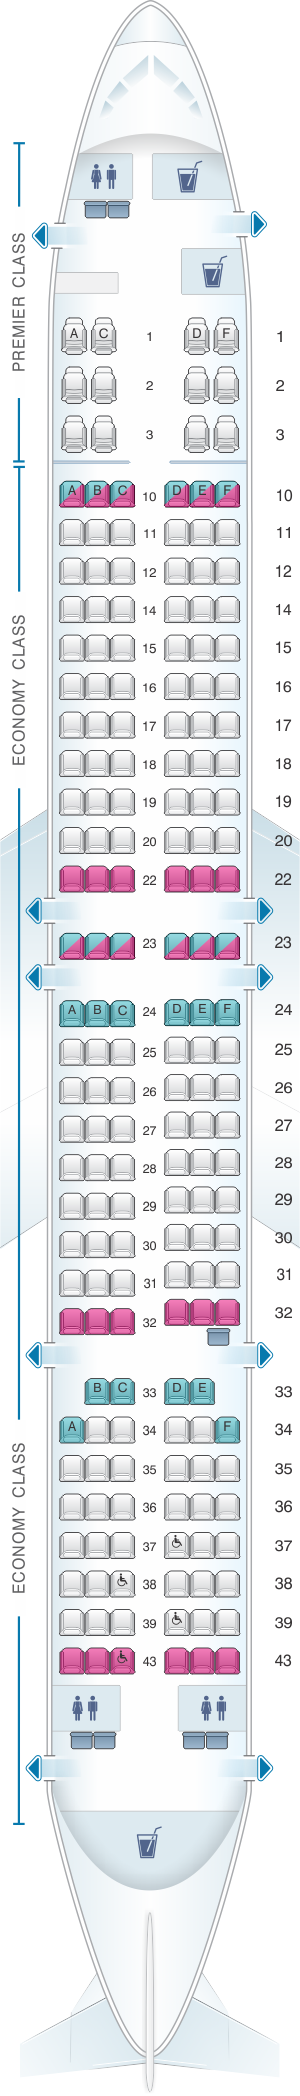 Seat map for Jet Airways Boeing B737 900ER 184PAX